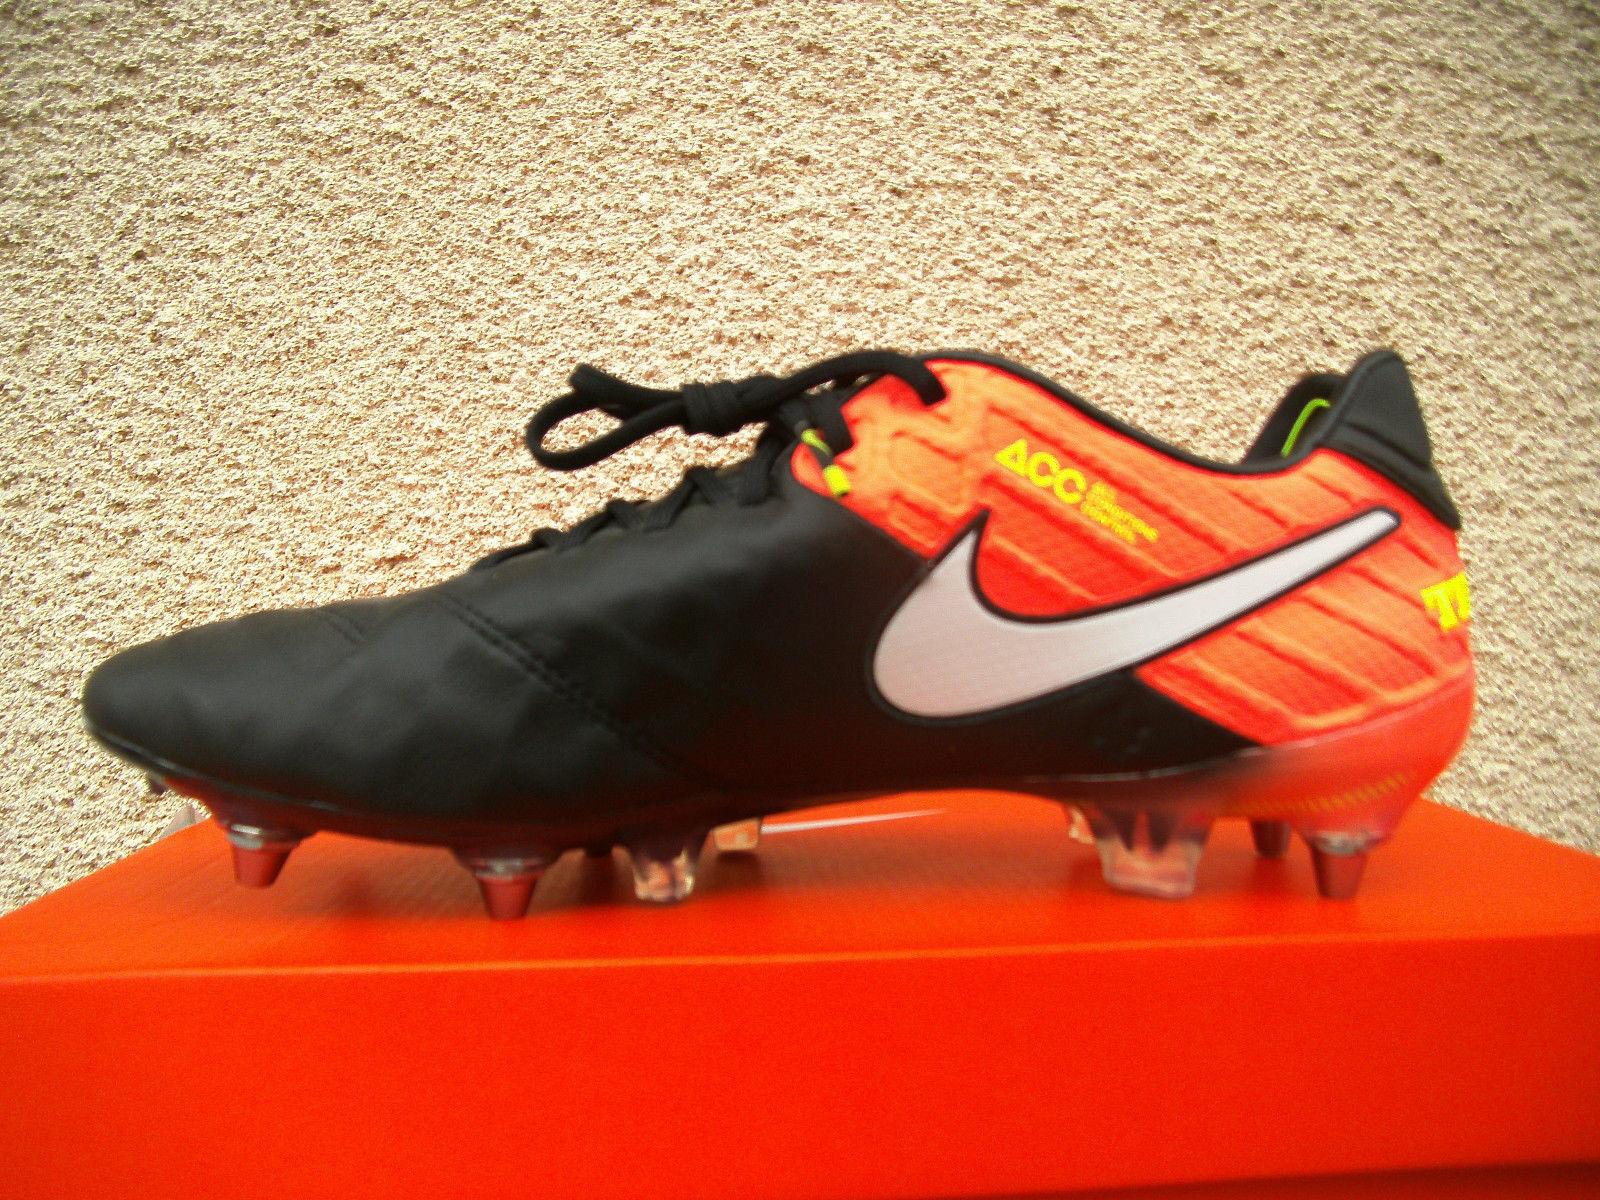 Nike Tiempo Legend VI SG Pro Schwarz-Rosa (819680 018) Gr. 40 - 44